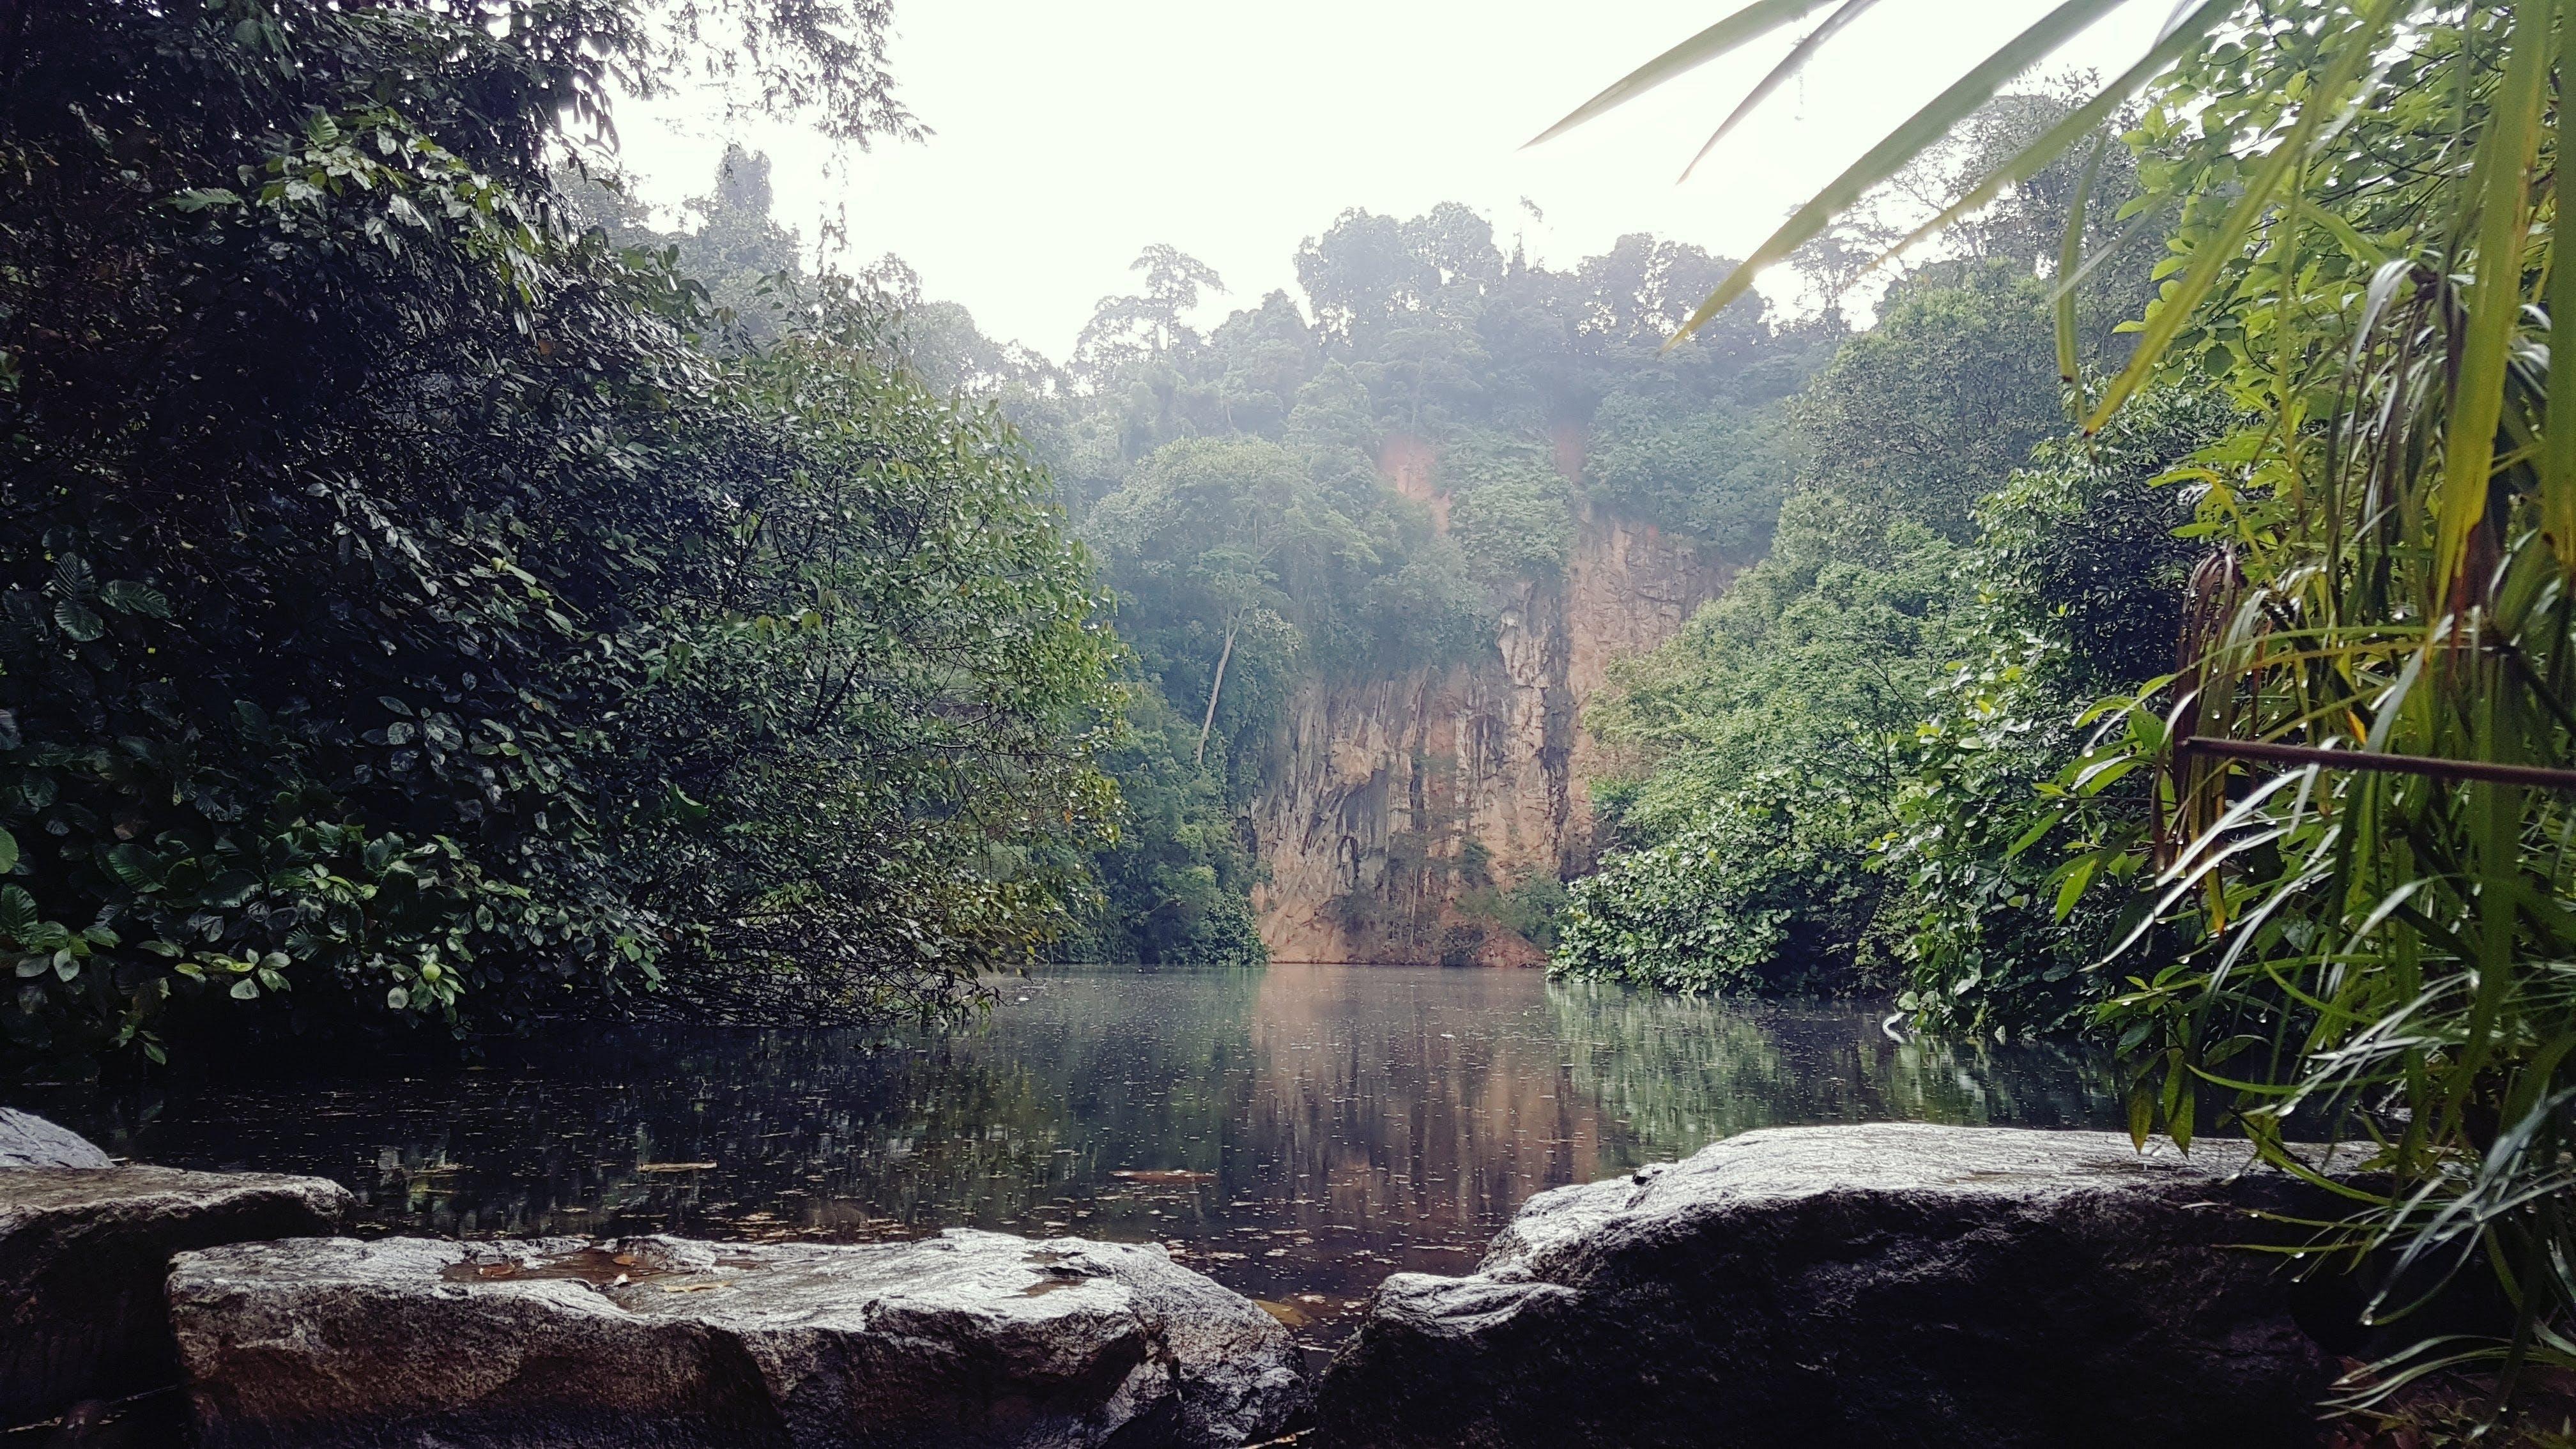 Forest Bathing & Wellness foREST  Bukit Batok Nature Park